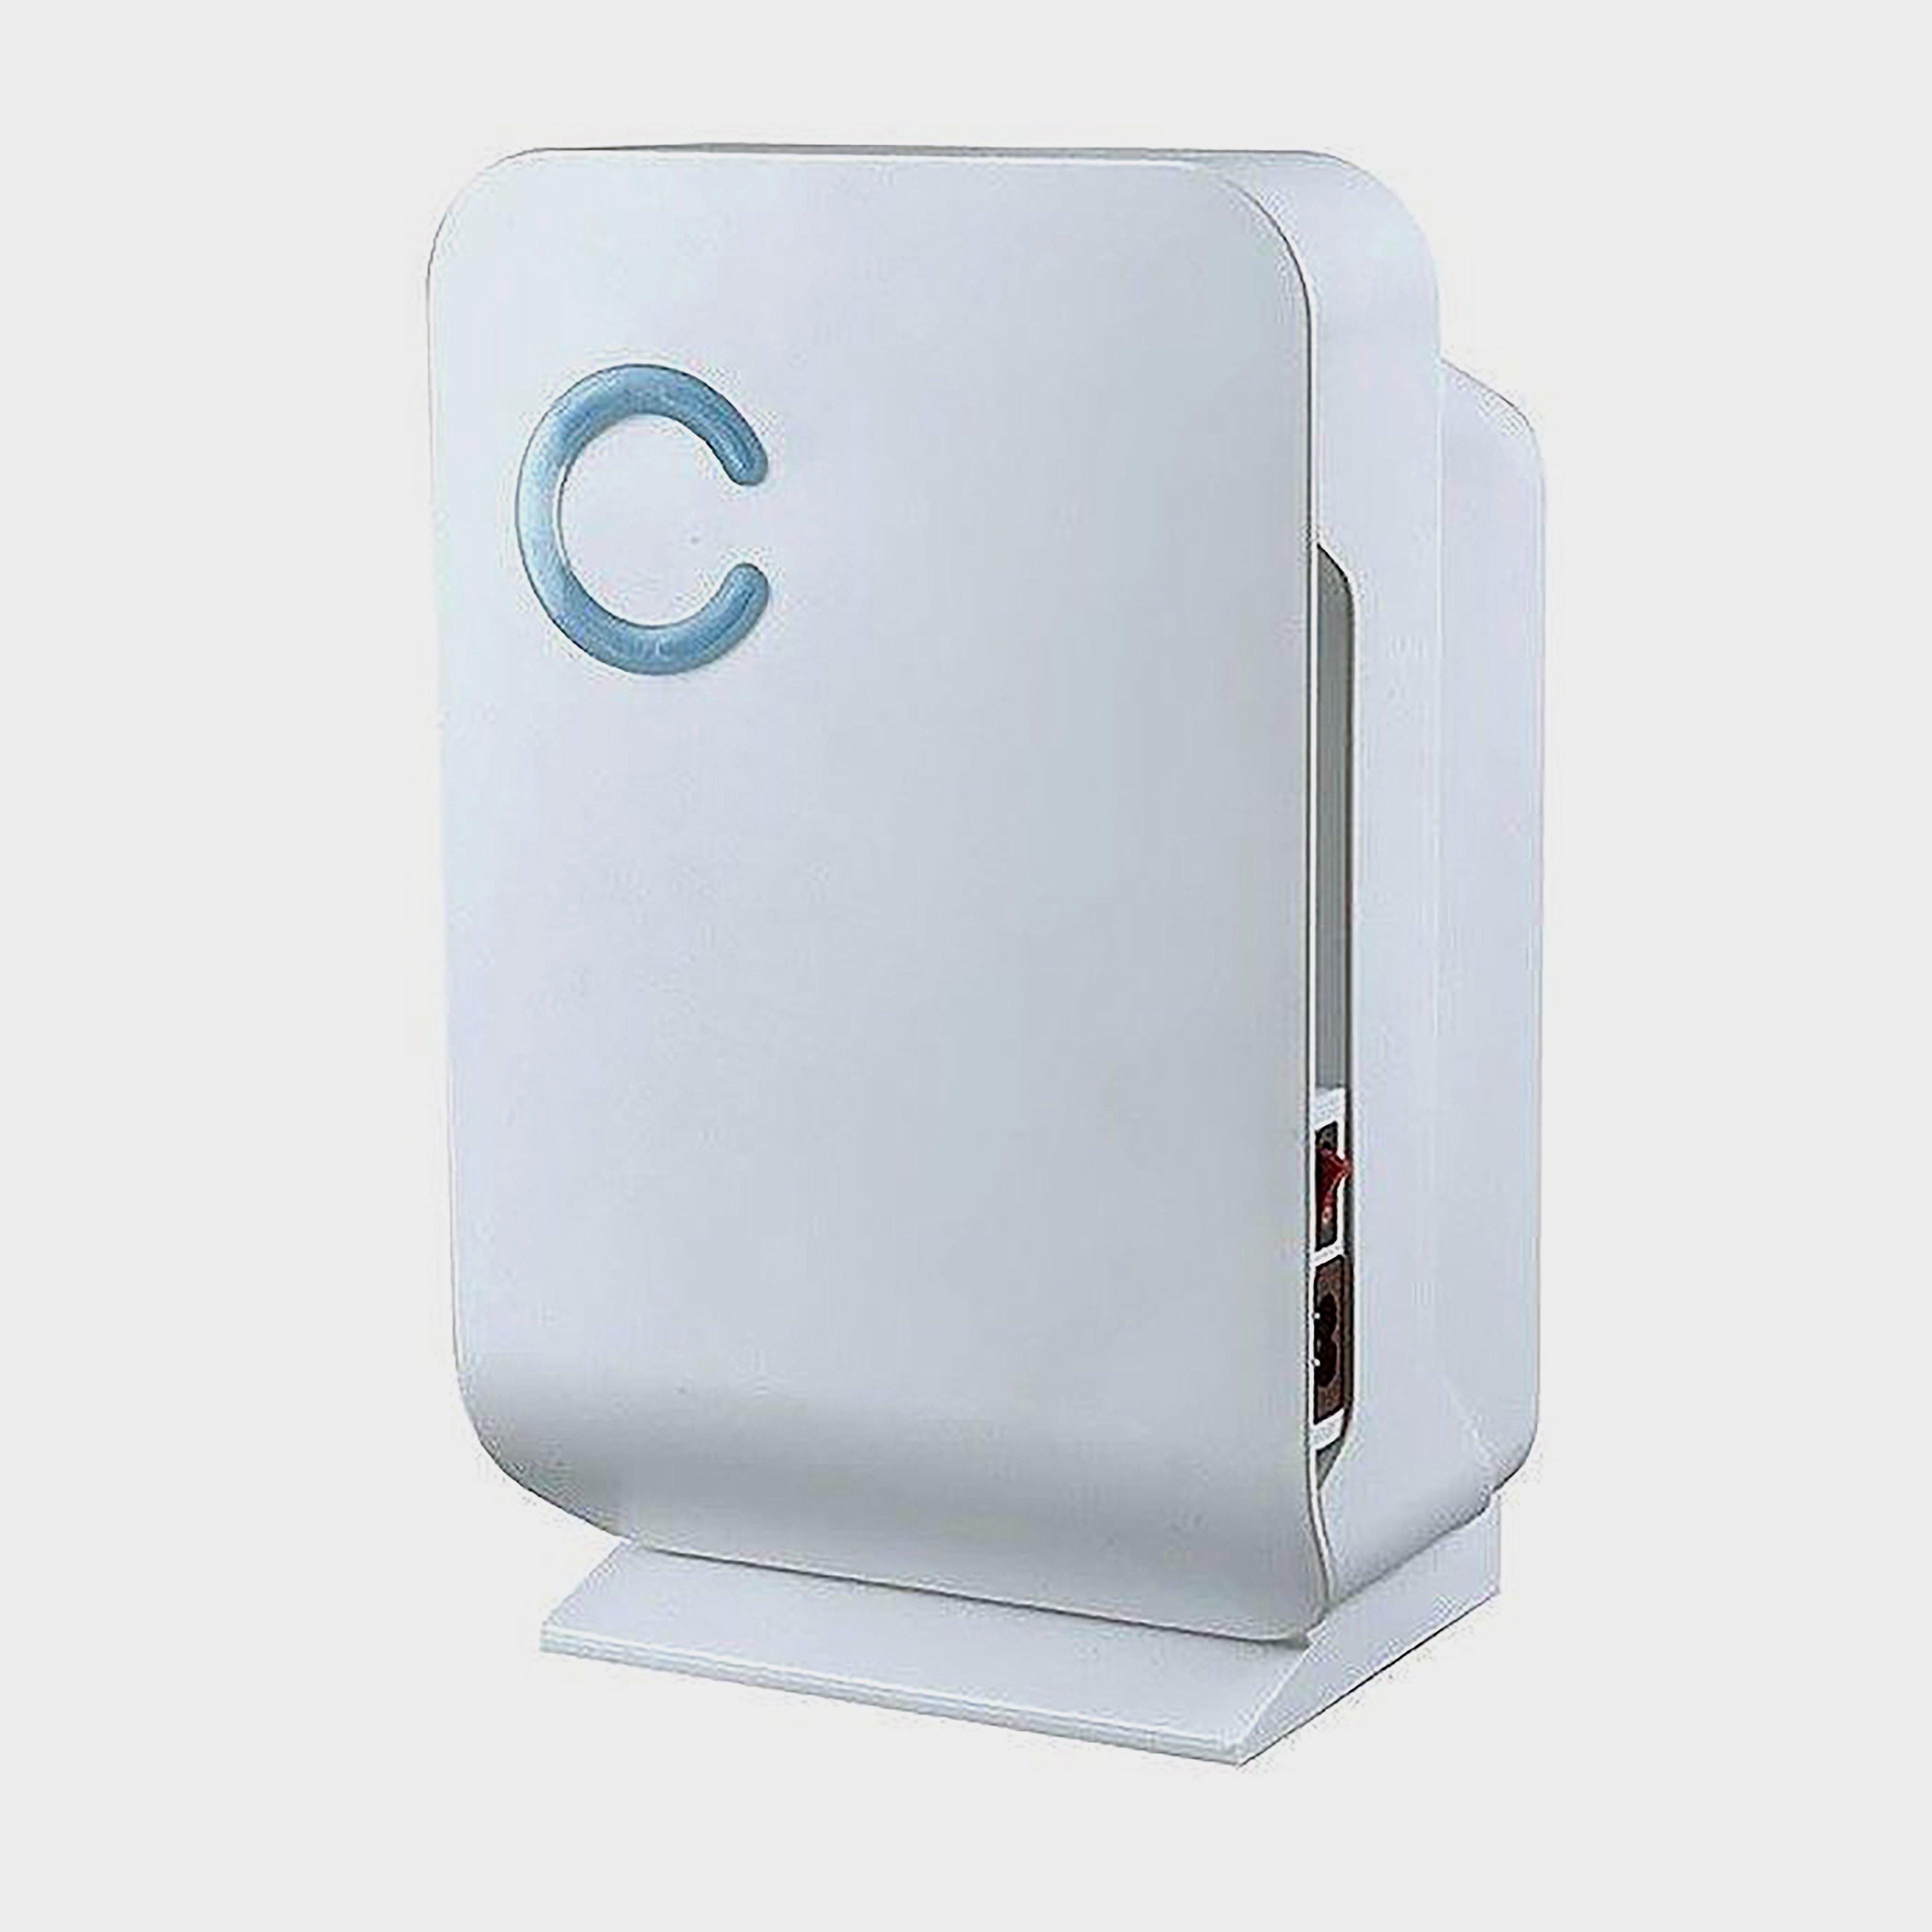 Streetwize Mini Dehumidifier - White/Dehumidifier, White